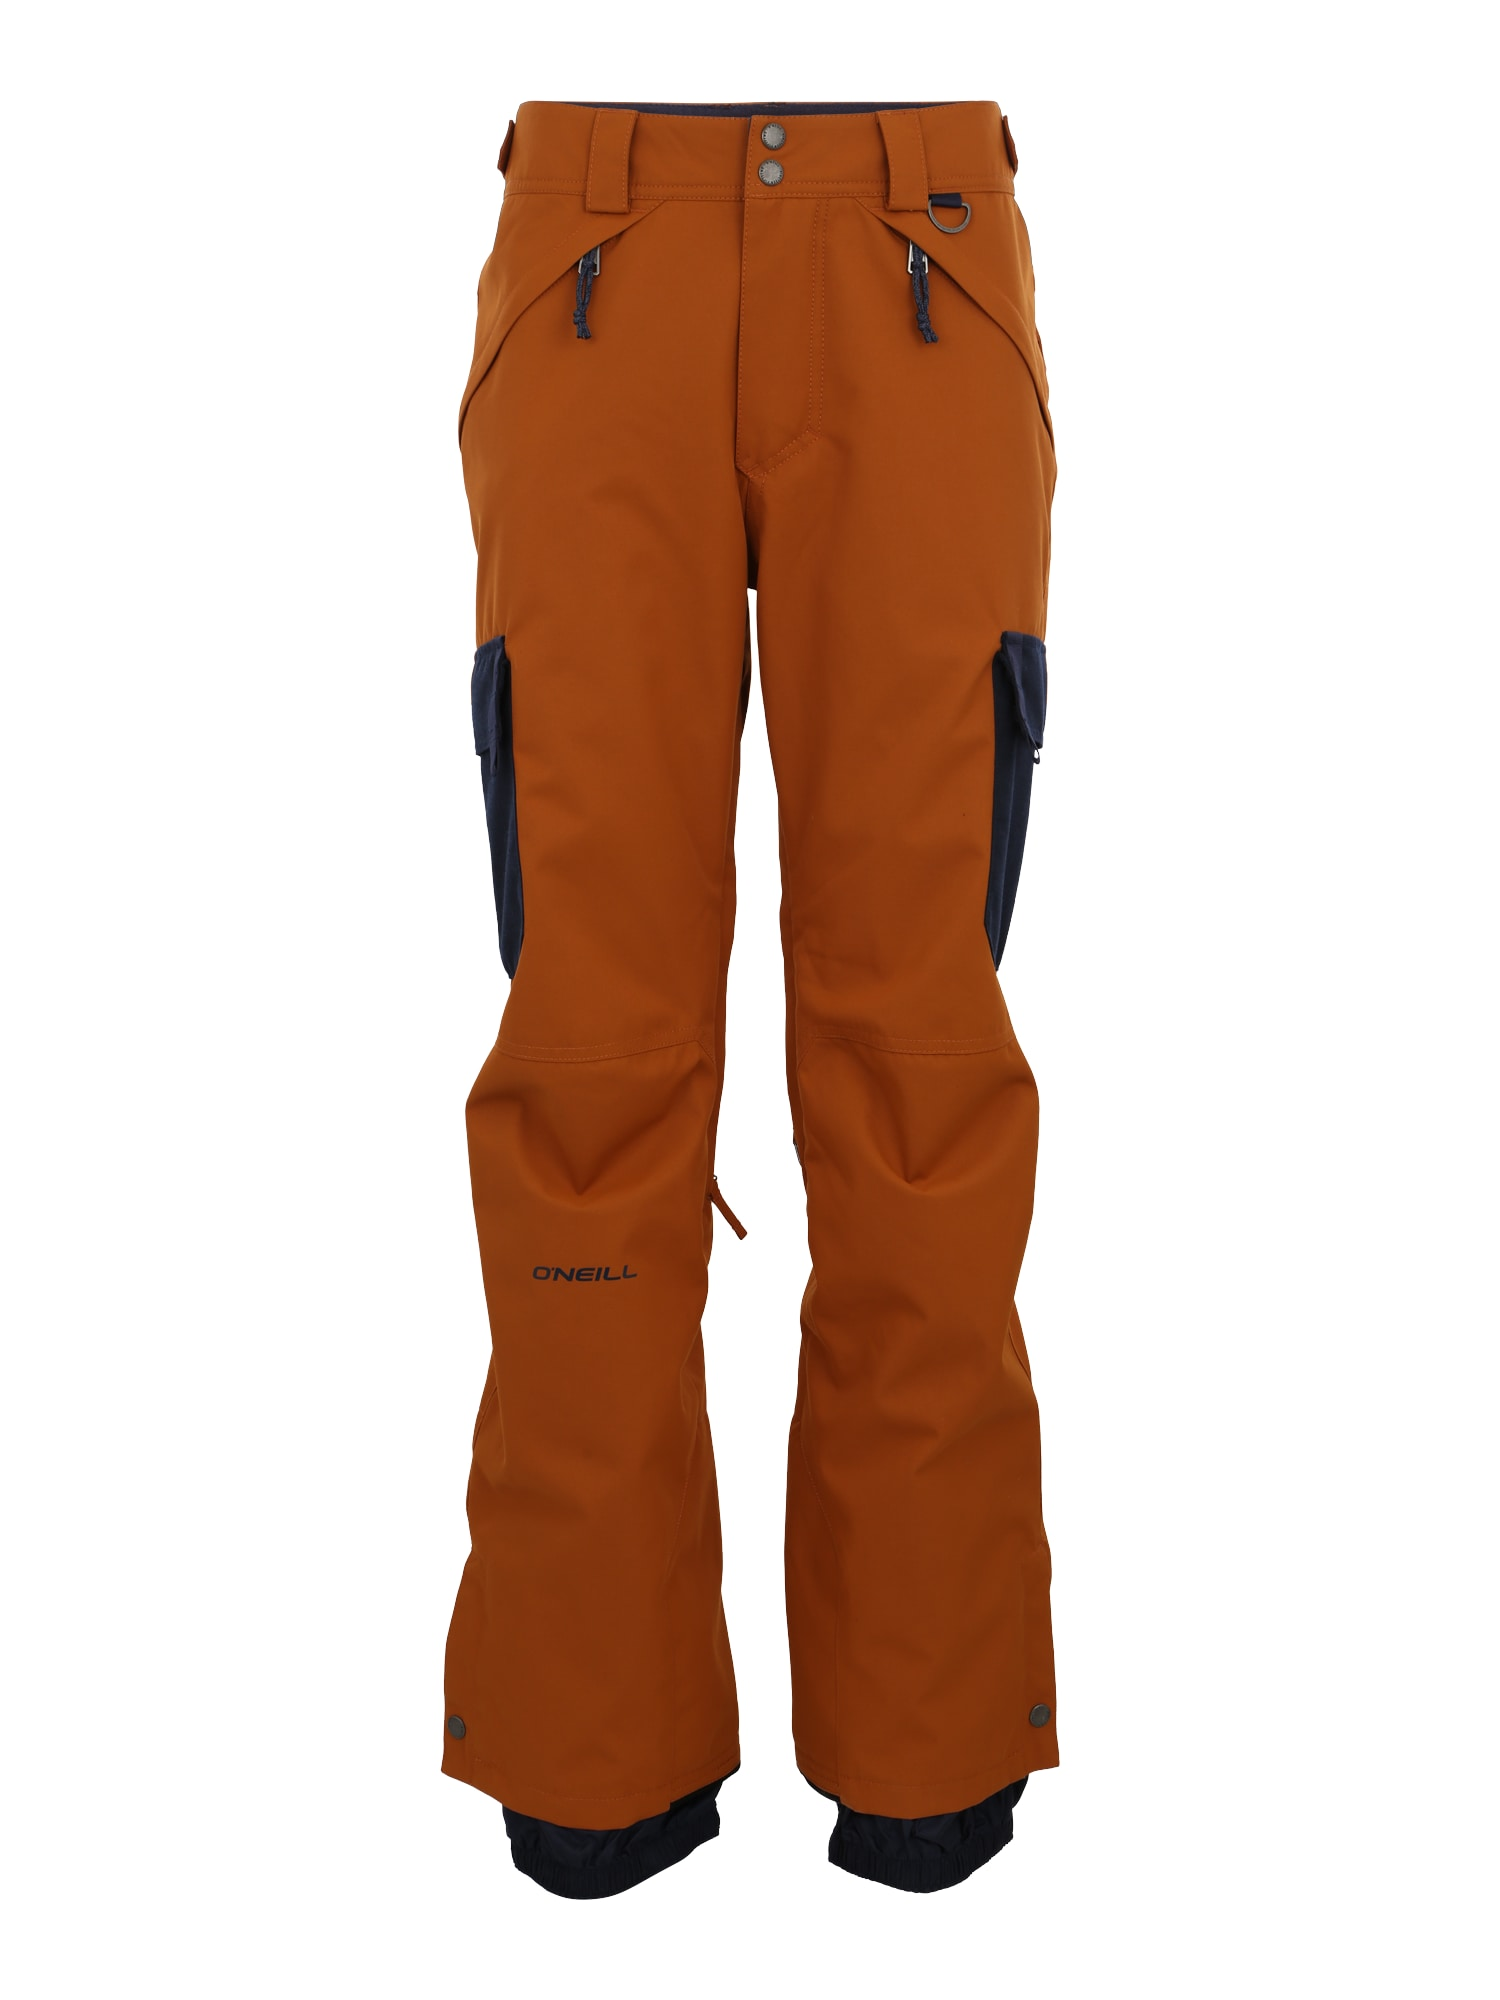 ONEILL Outdoorové kalhoty Hybrid Friday tmavě oranžová černá O'NEILL